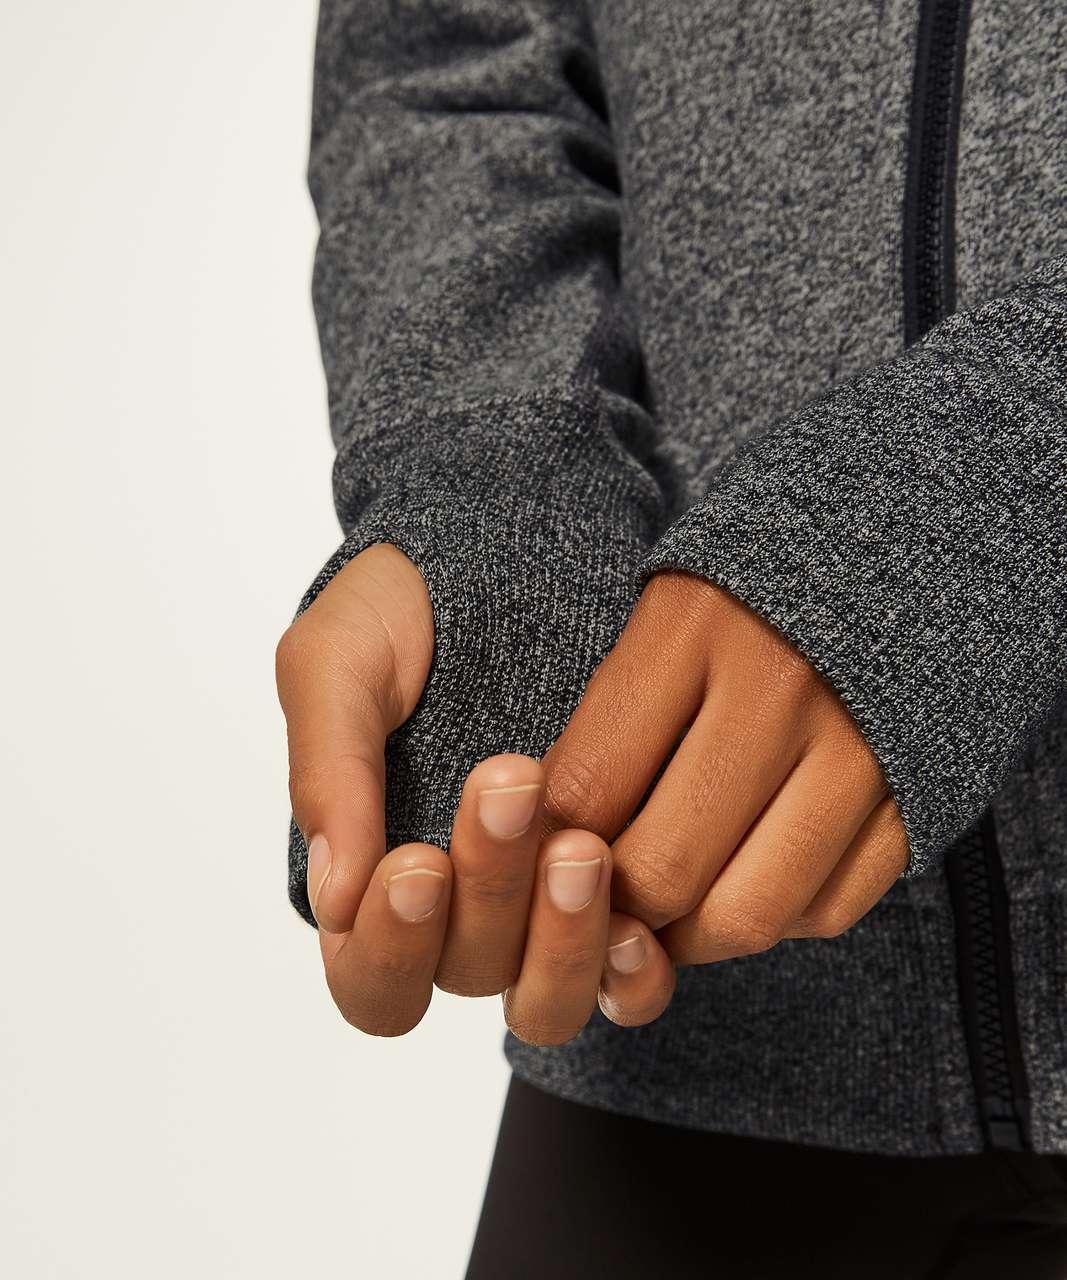 Lululemon Scuba Hoodie Classic Cotton Fleece - Heathered Speckled Black / Black